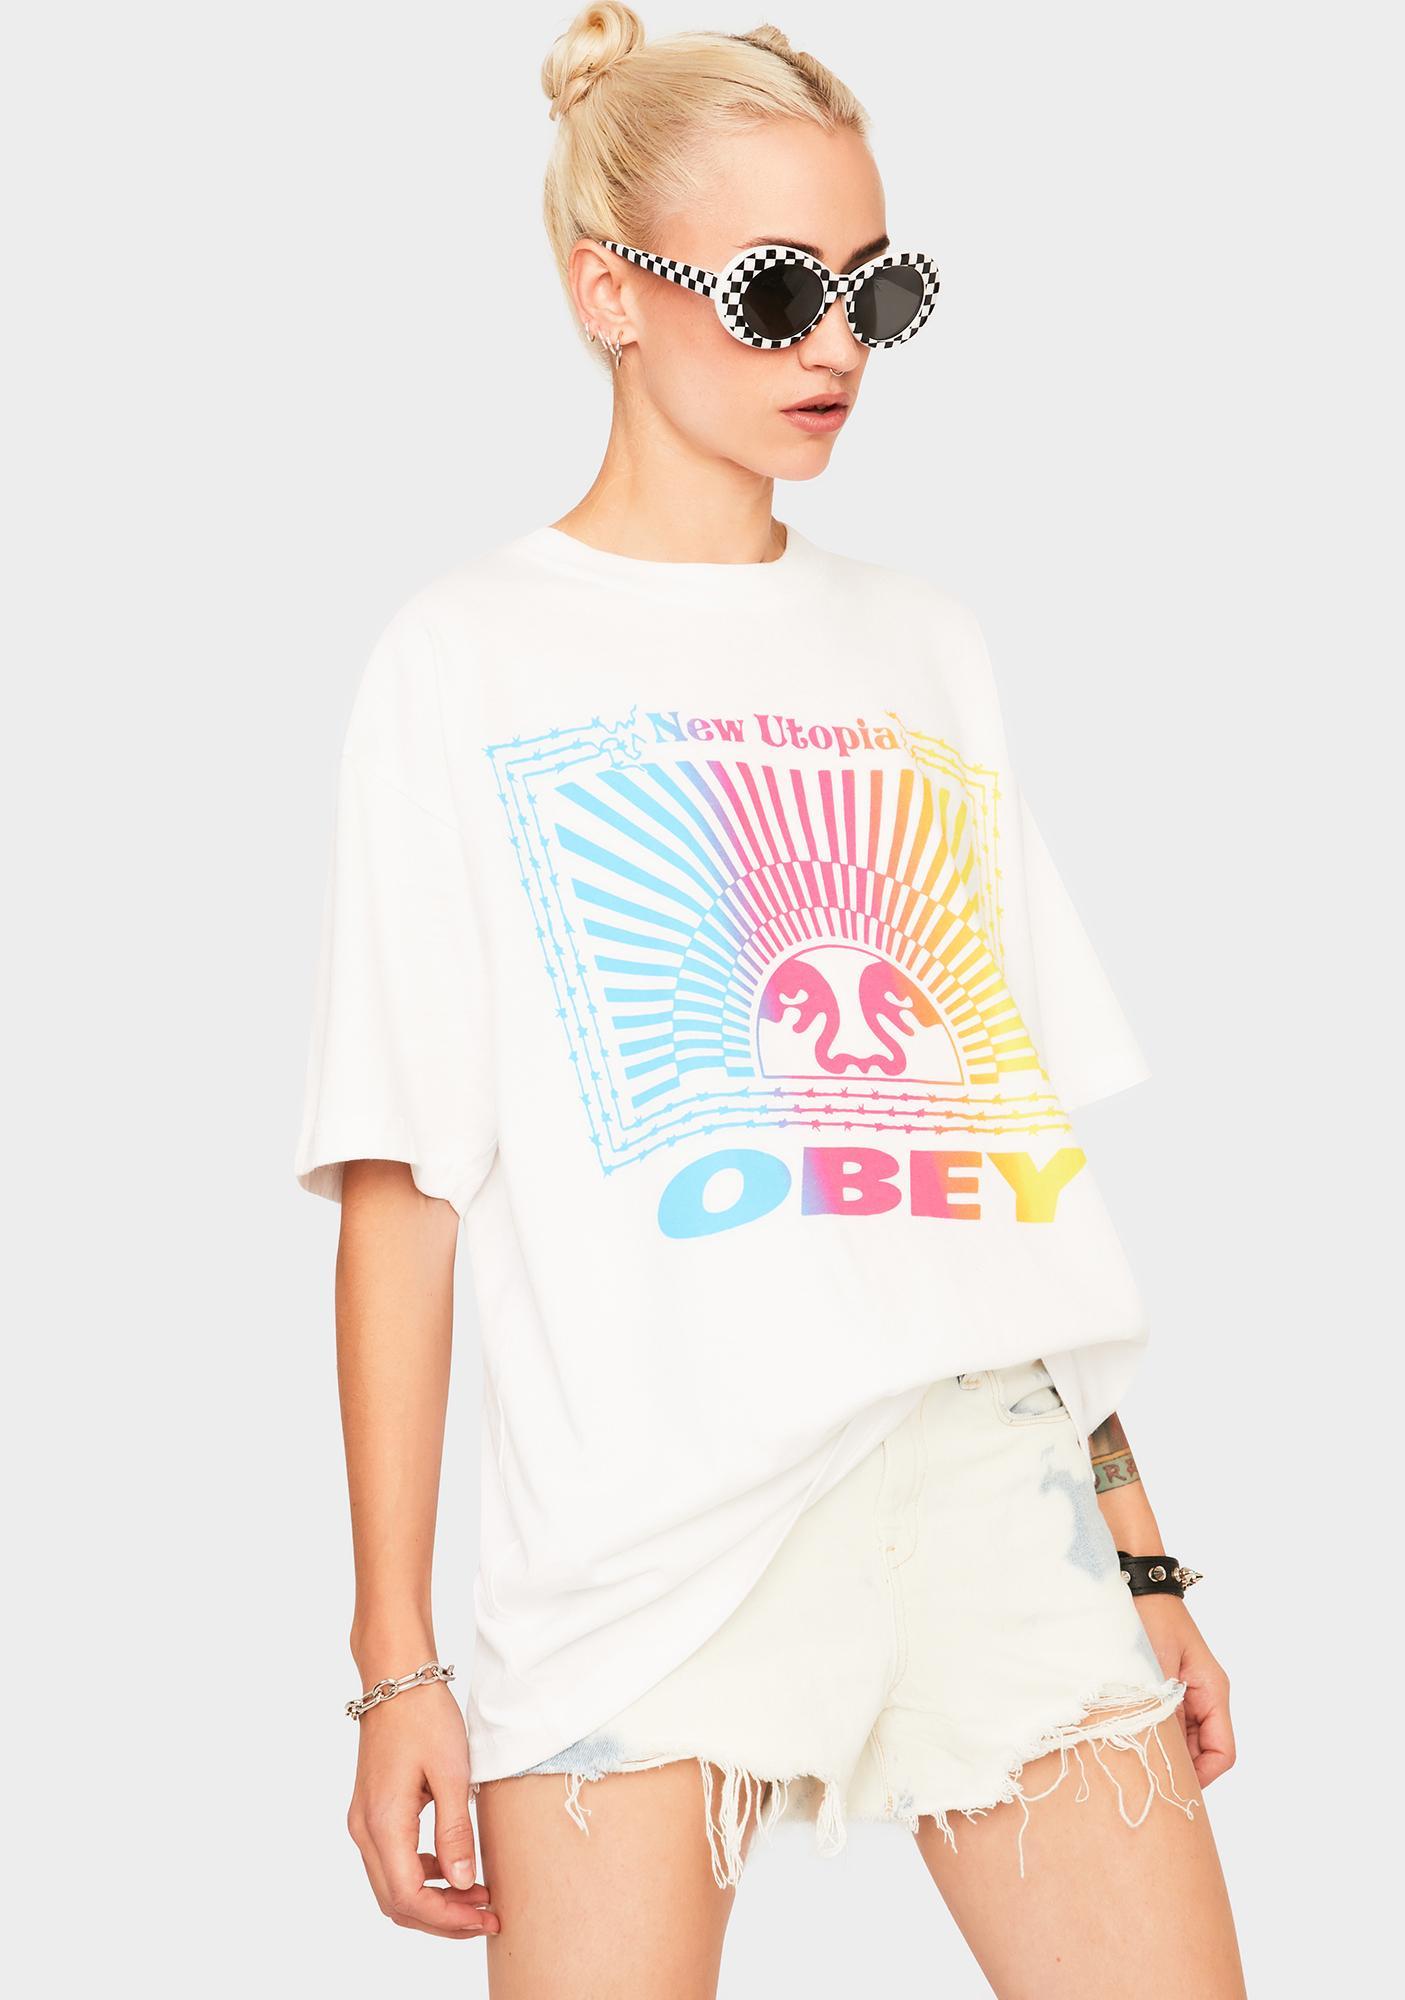 Obey New Utopia Graphic Tee